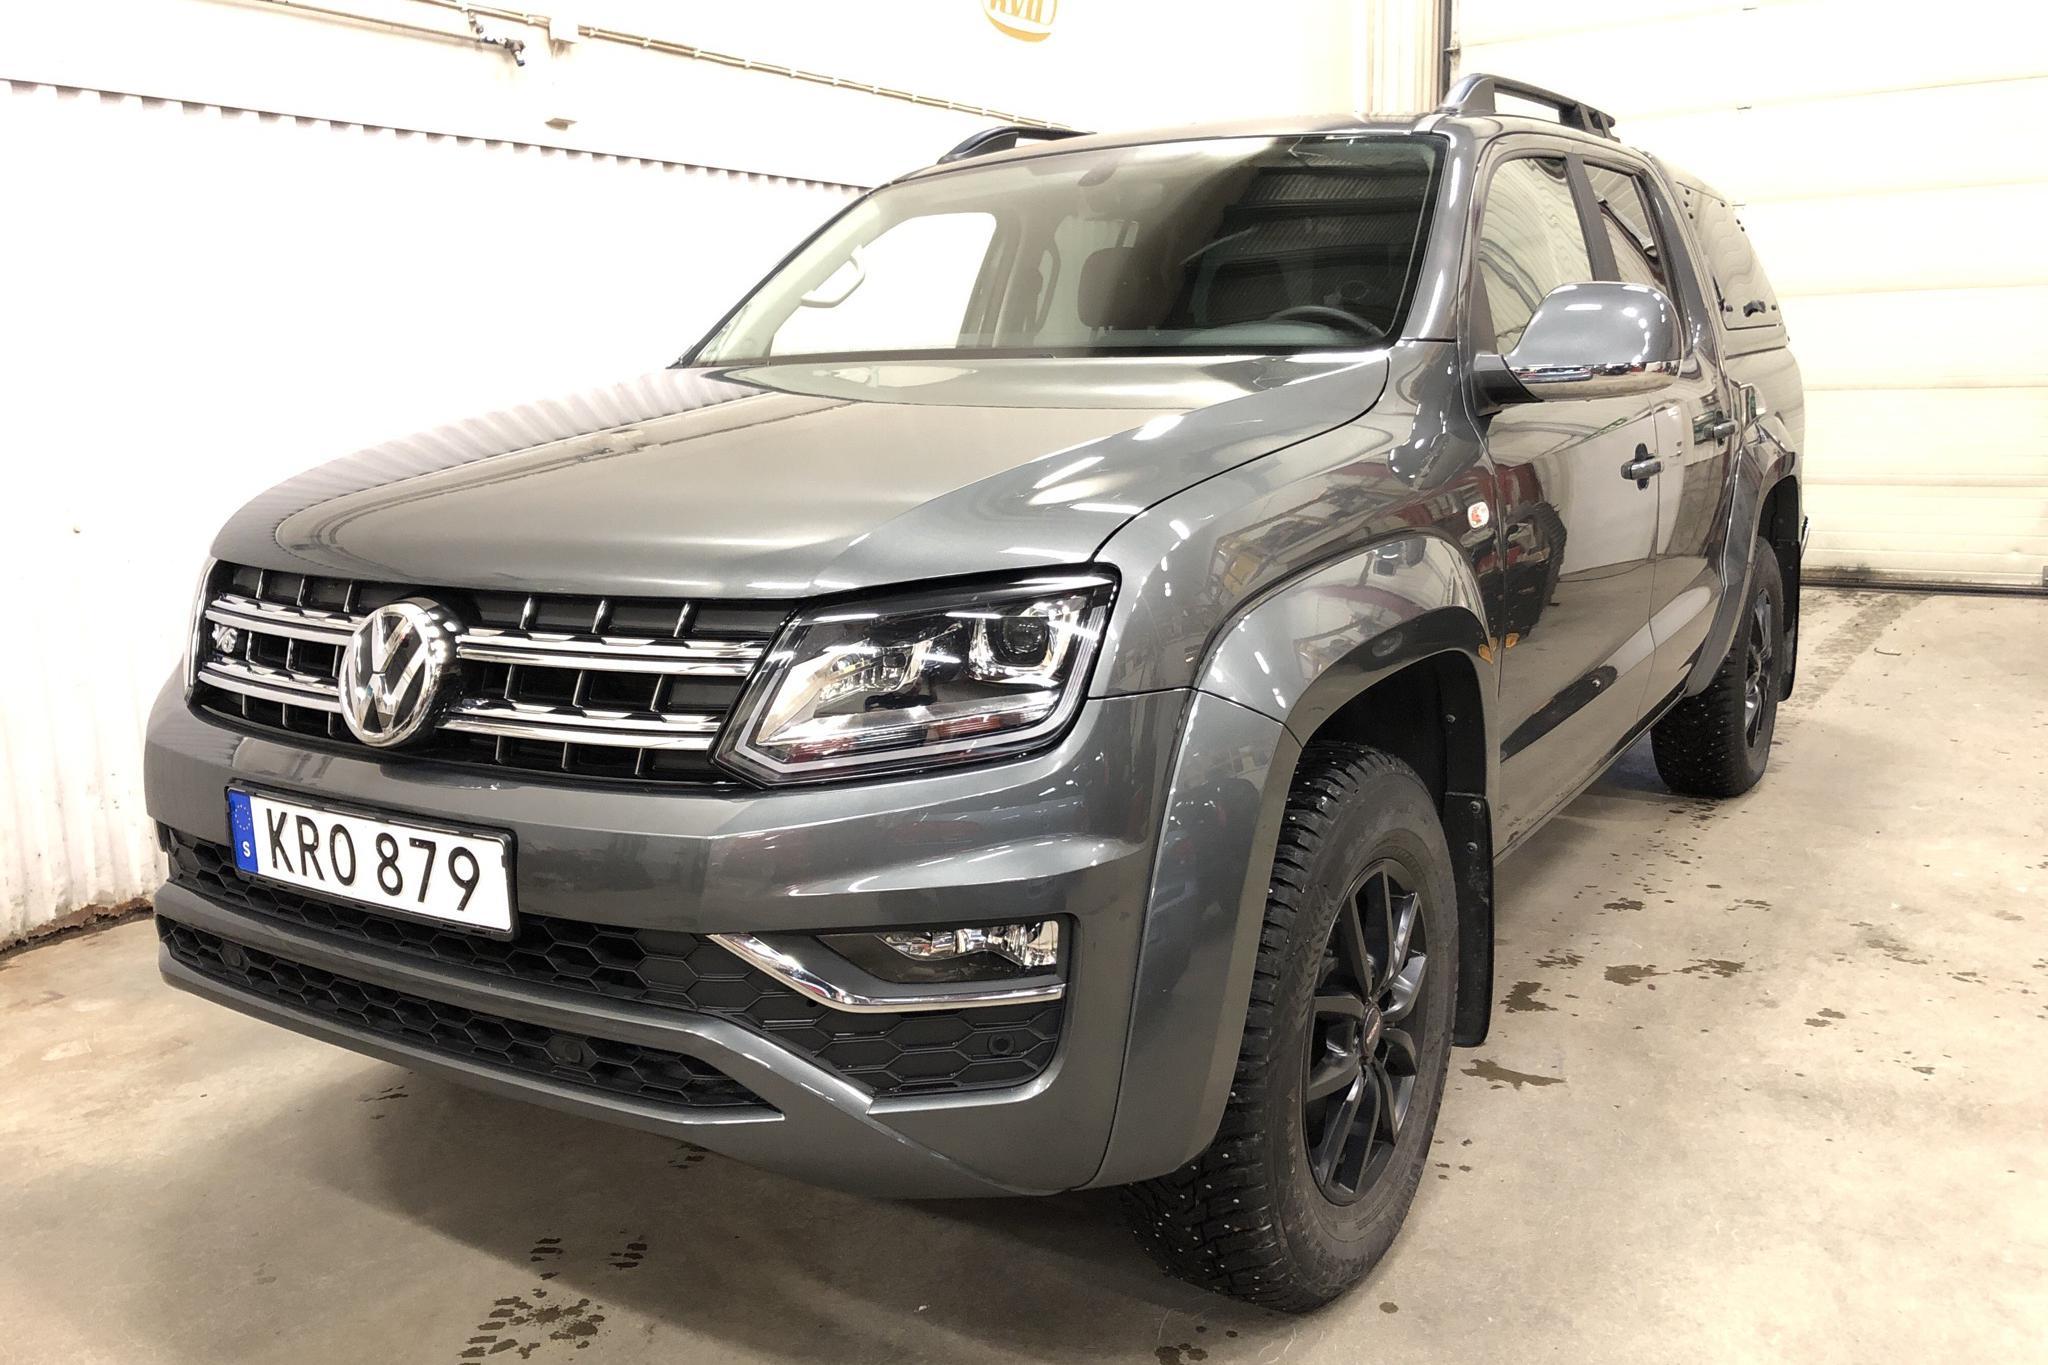 VW Amarok 3.0 TDI 4motion (258hk) - 2 926 mil - Automat - grå - 2019